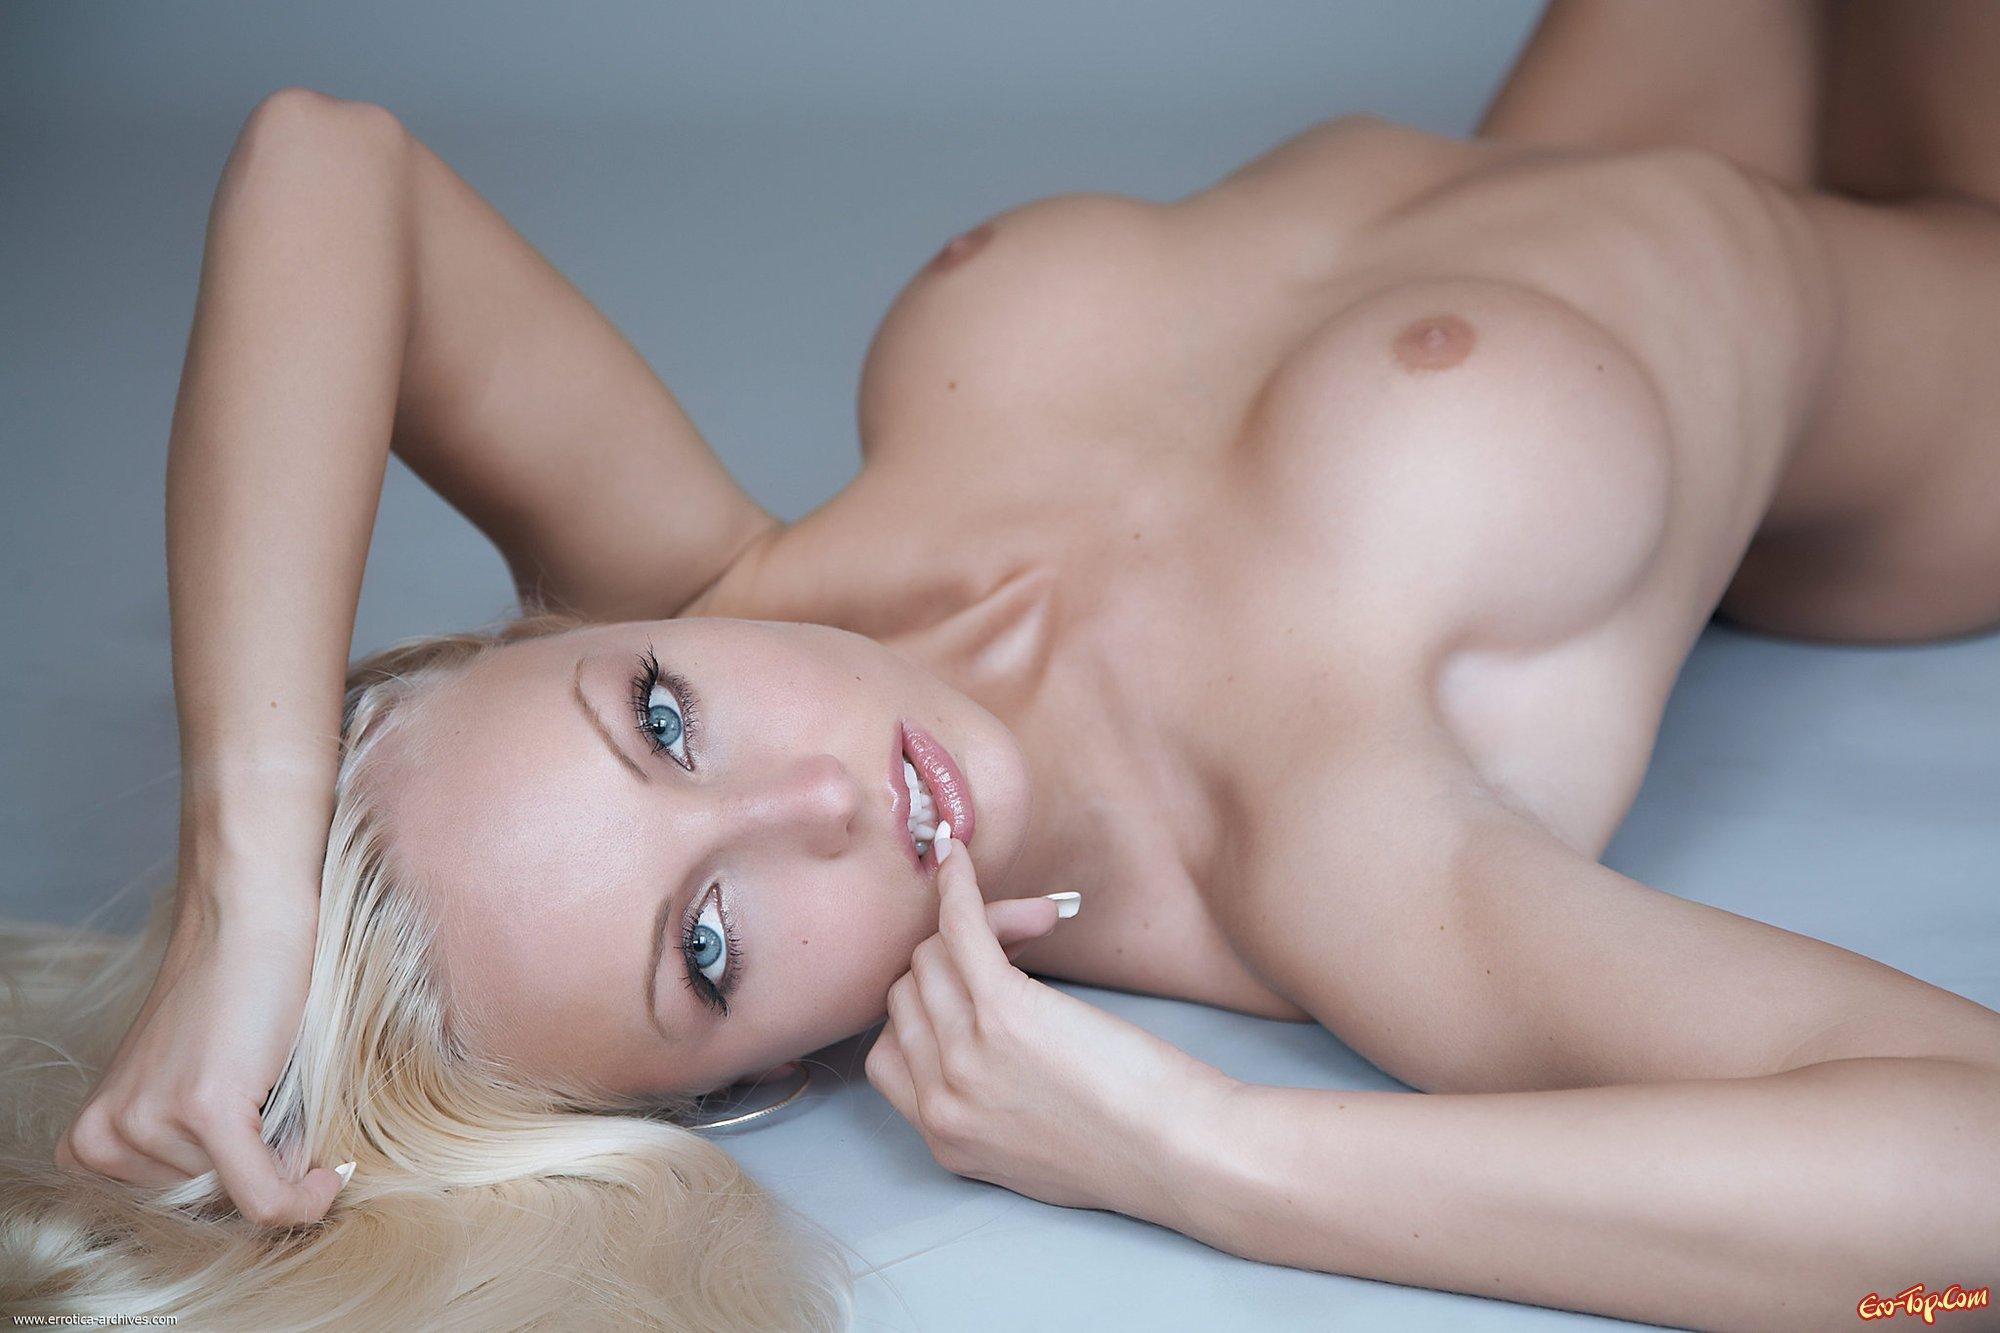 Victoria some nude